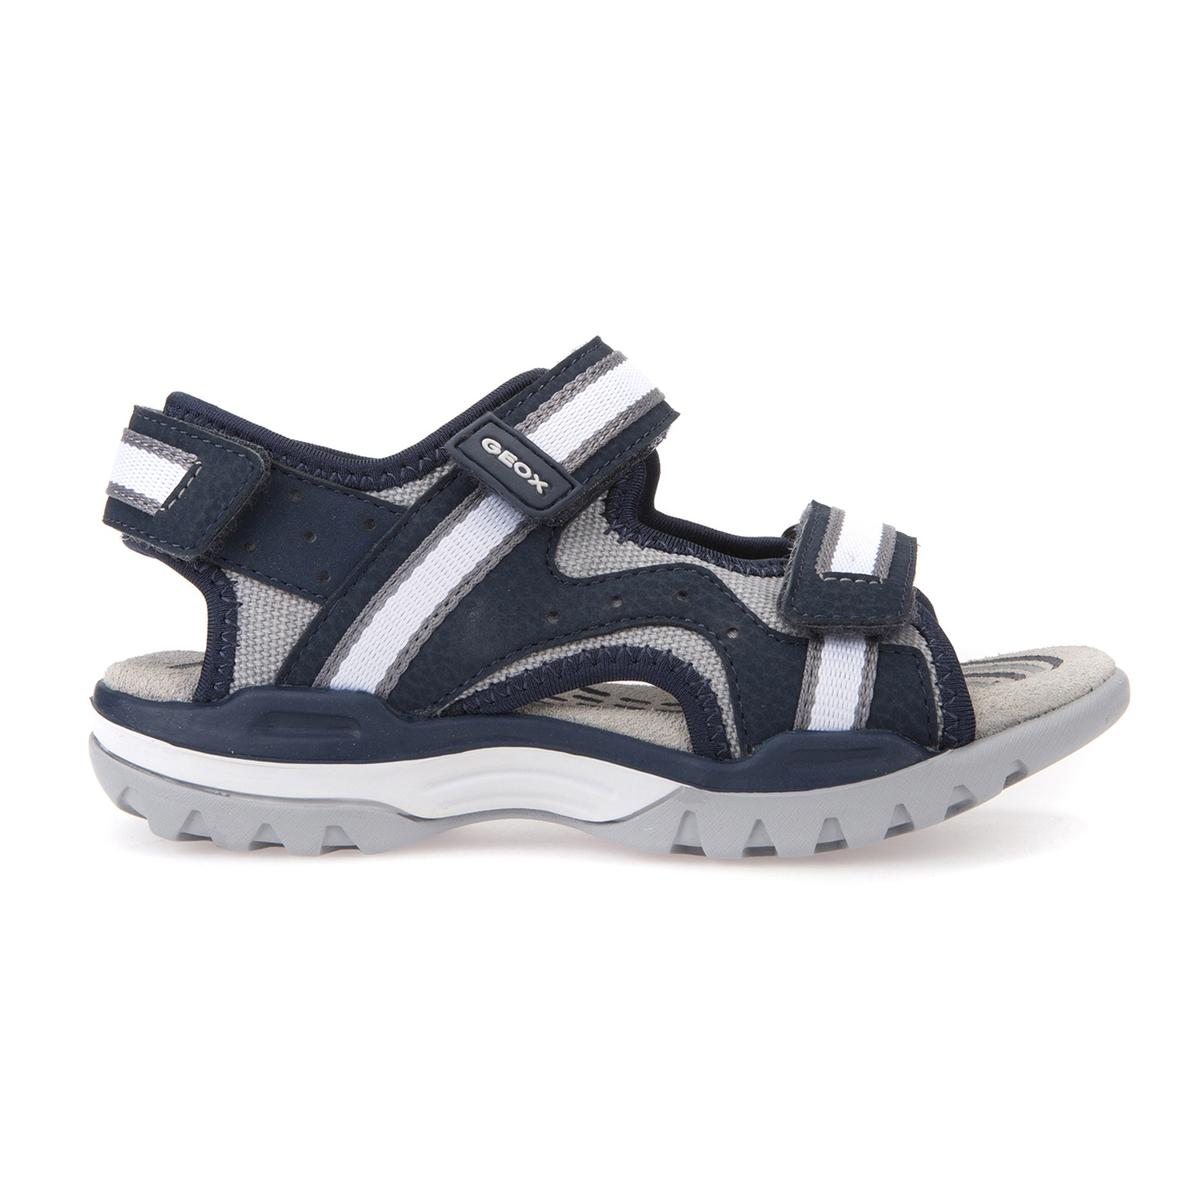 j borealis boy b sandals